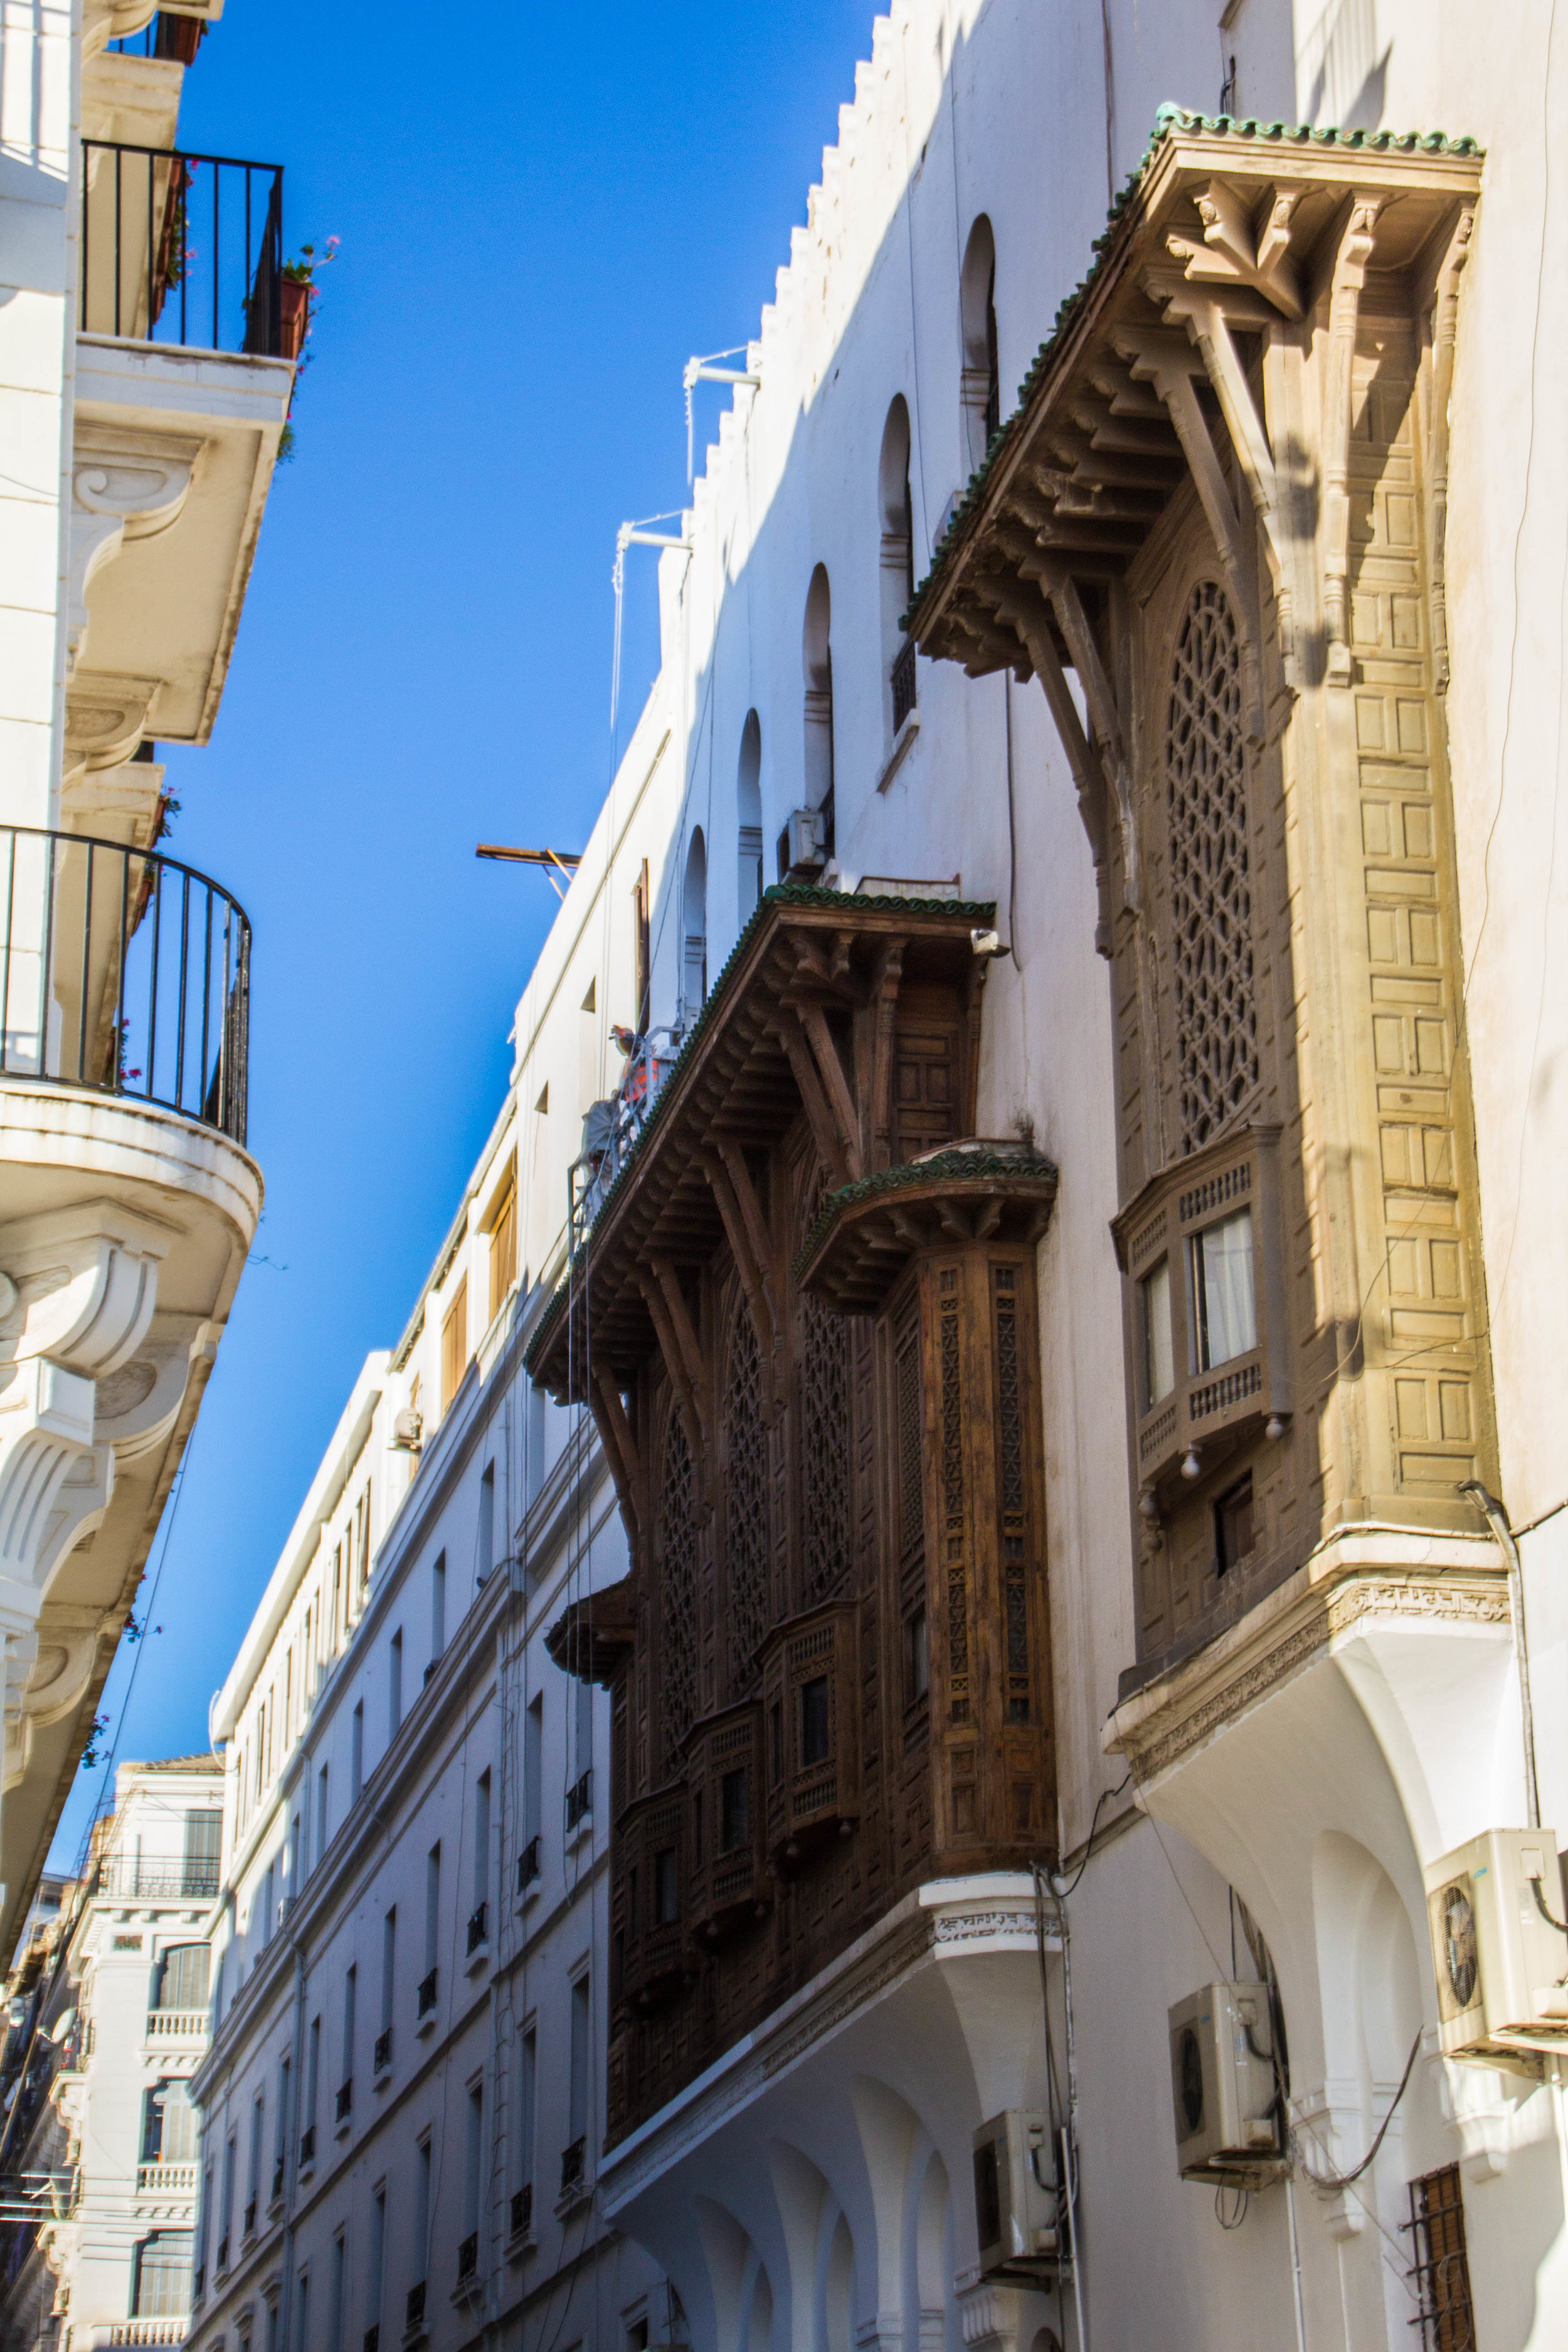 street-photography-algiers-algeria-15.jpg